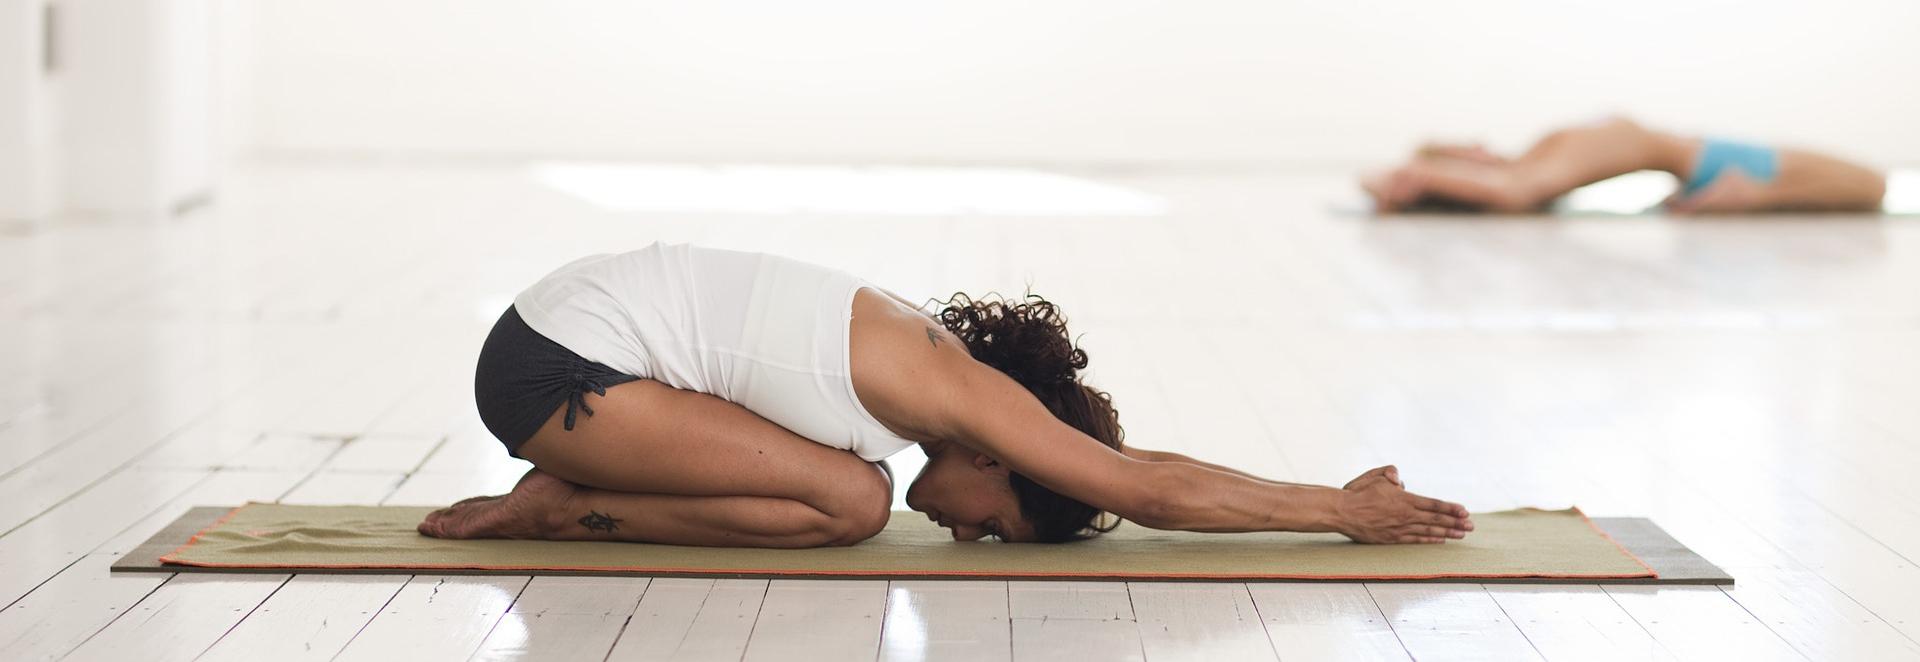 Minikyogees | Yoga Güncem